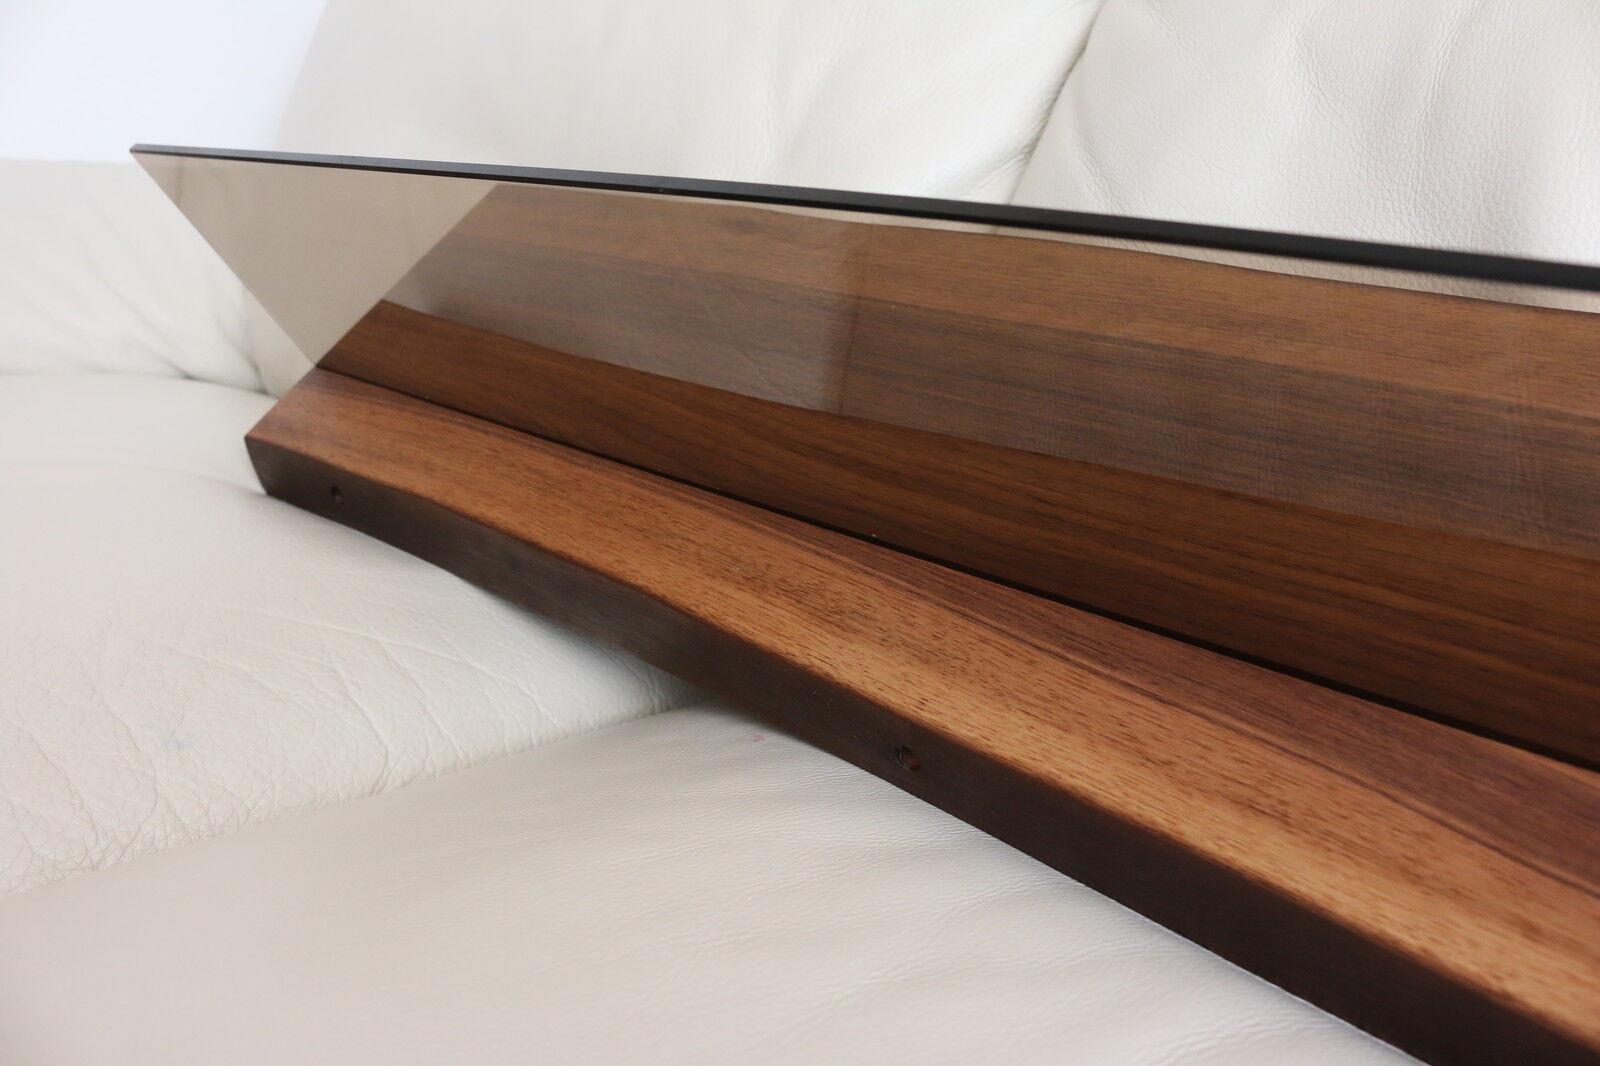 wandboard nussbaum massiv holz board regal glasregal regalbrett neu baumkante eur 299 00. Black Bedroom Furniture Sets. Home Design Ideas